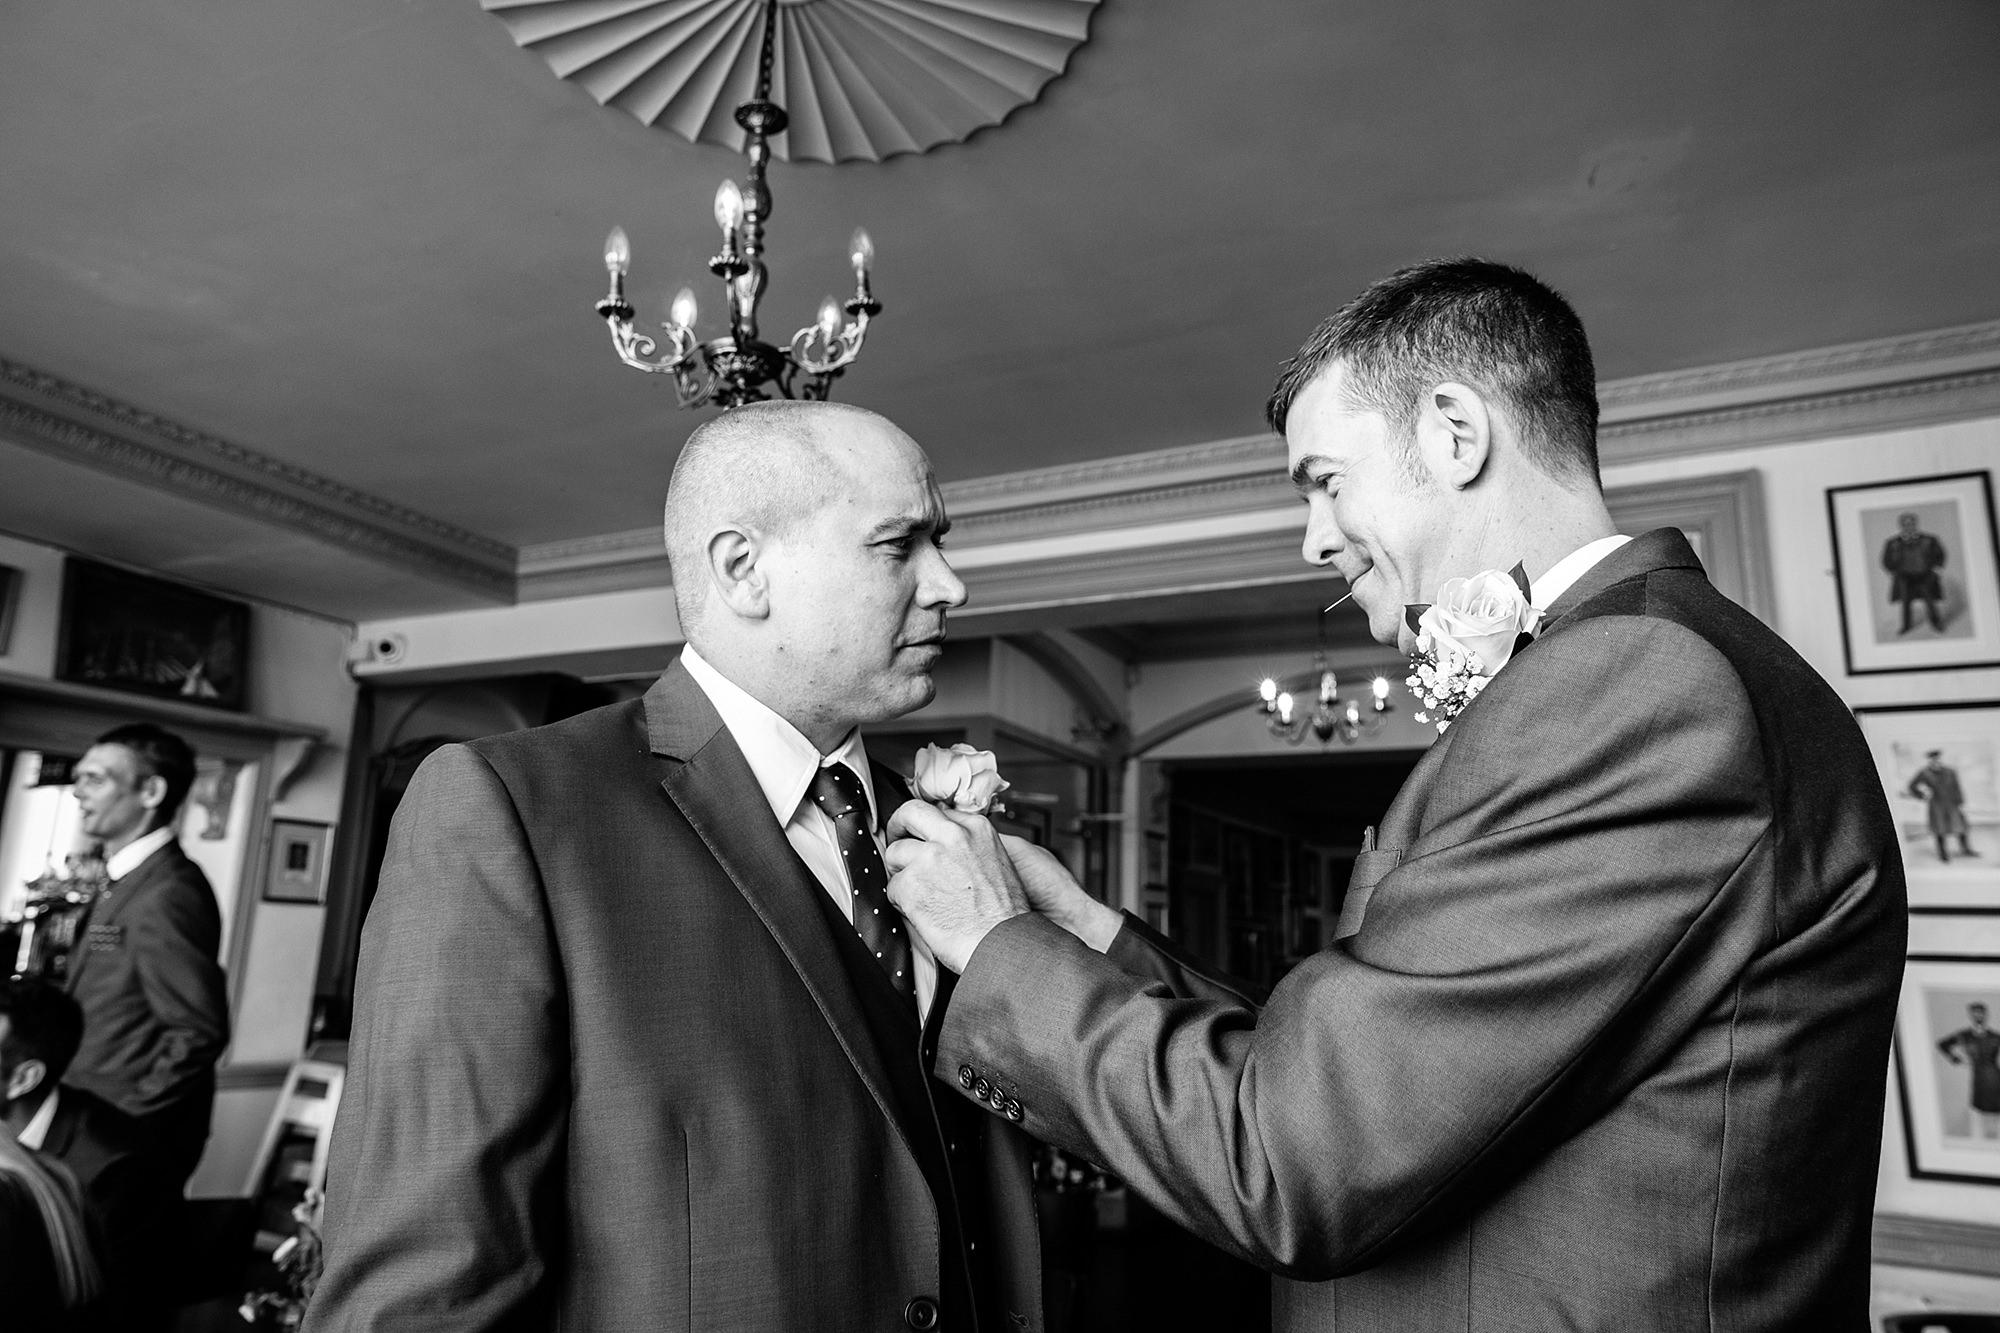 Trafalgar Tavern wedding groom and best man with buttonholes